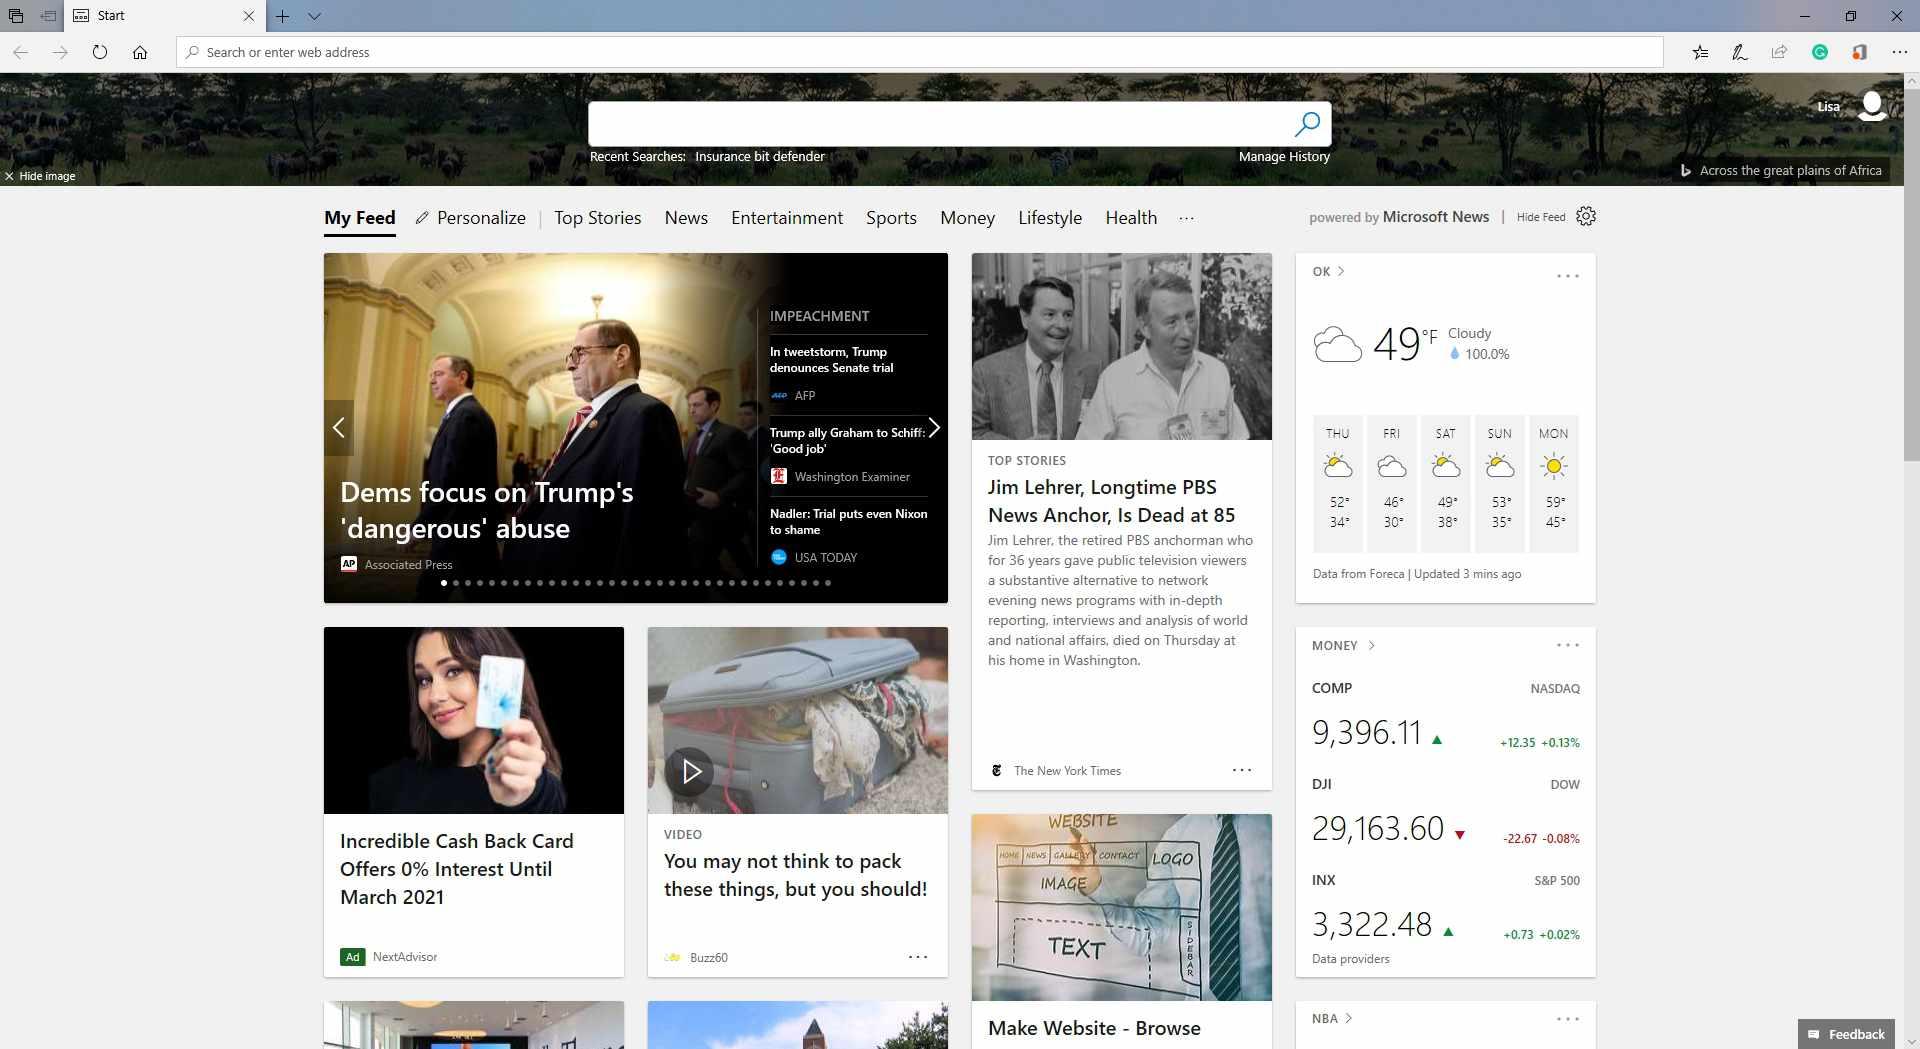 The Microsoft Edge homepage.